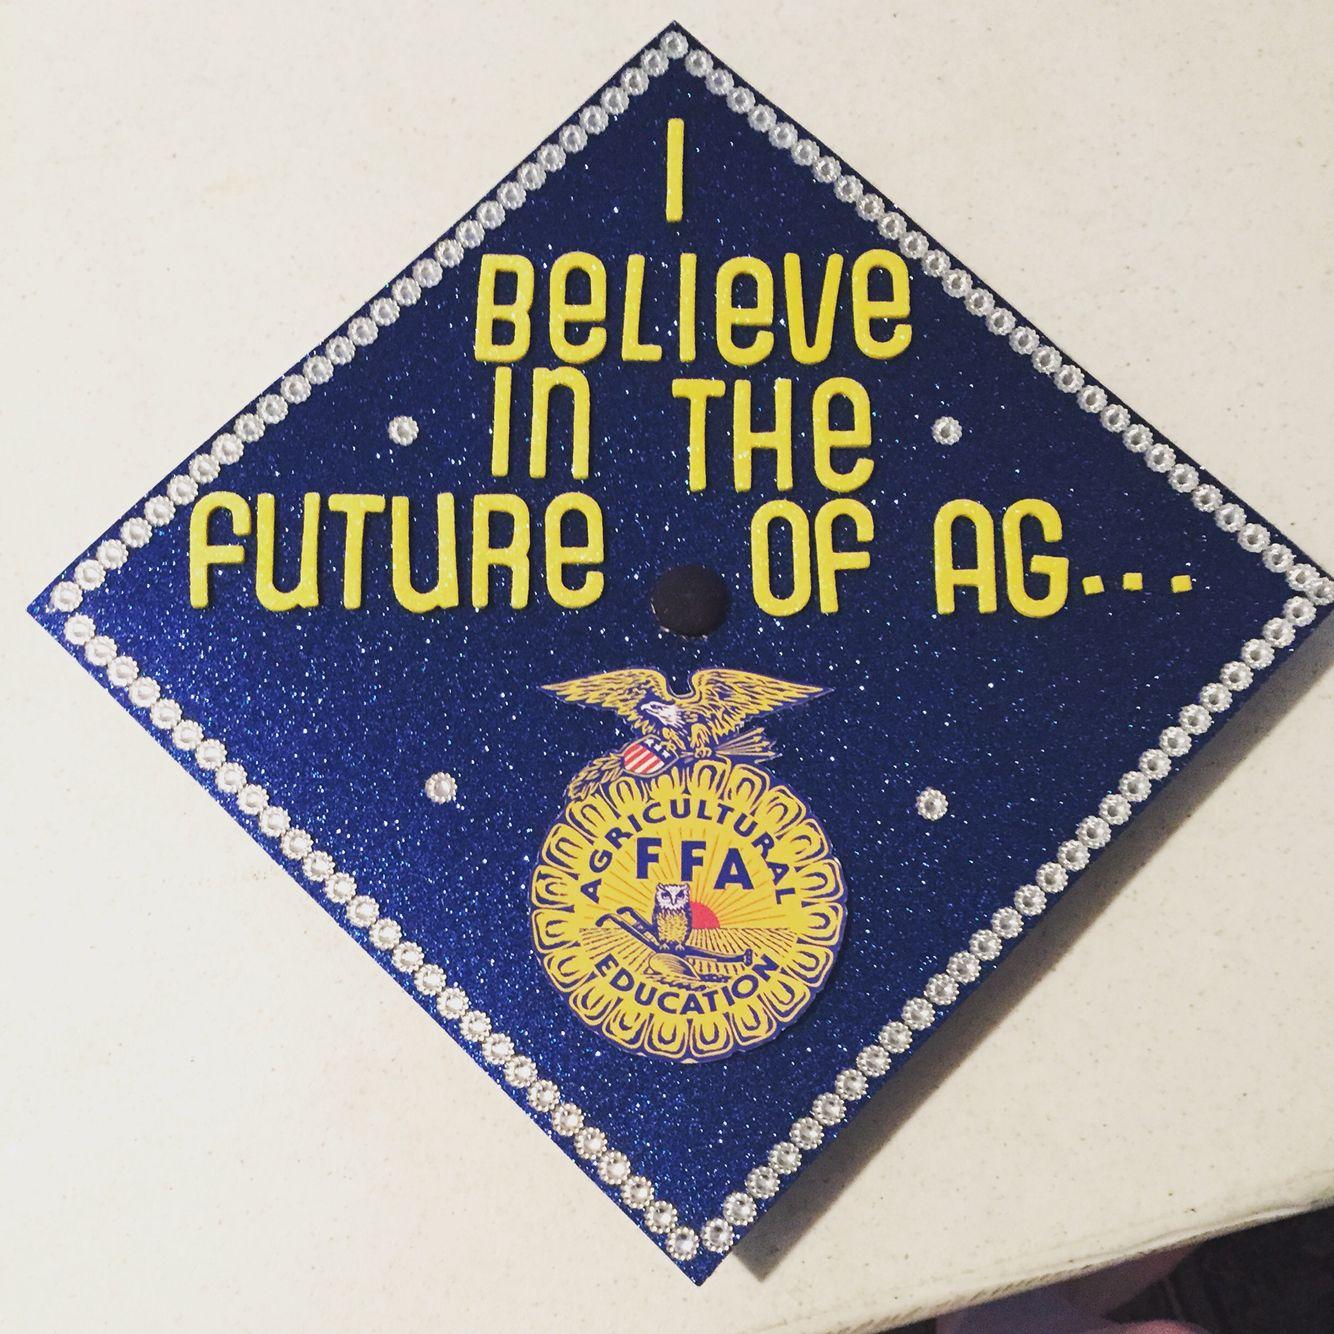 Decorating graduation cap ideas for teachers - Inspiration For My Graduation Cap